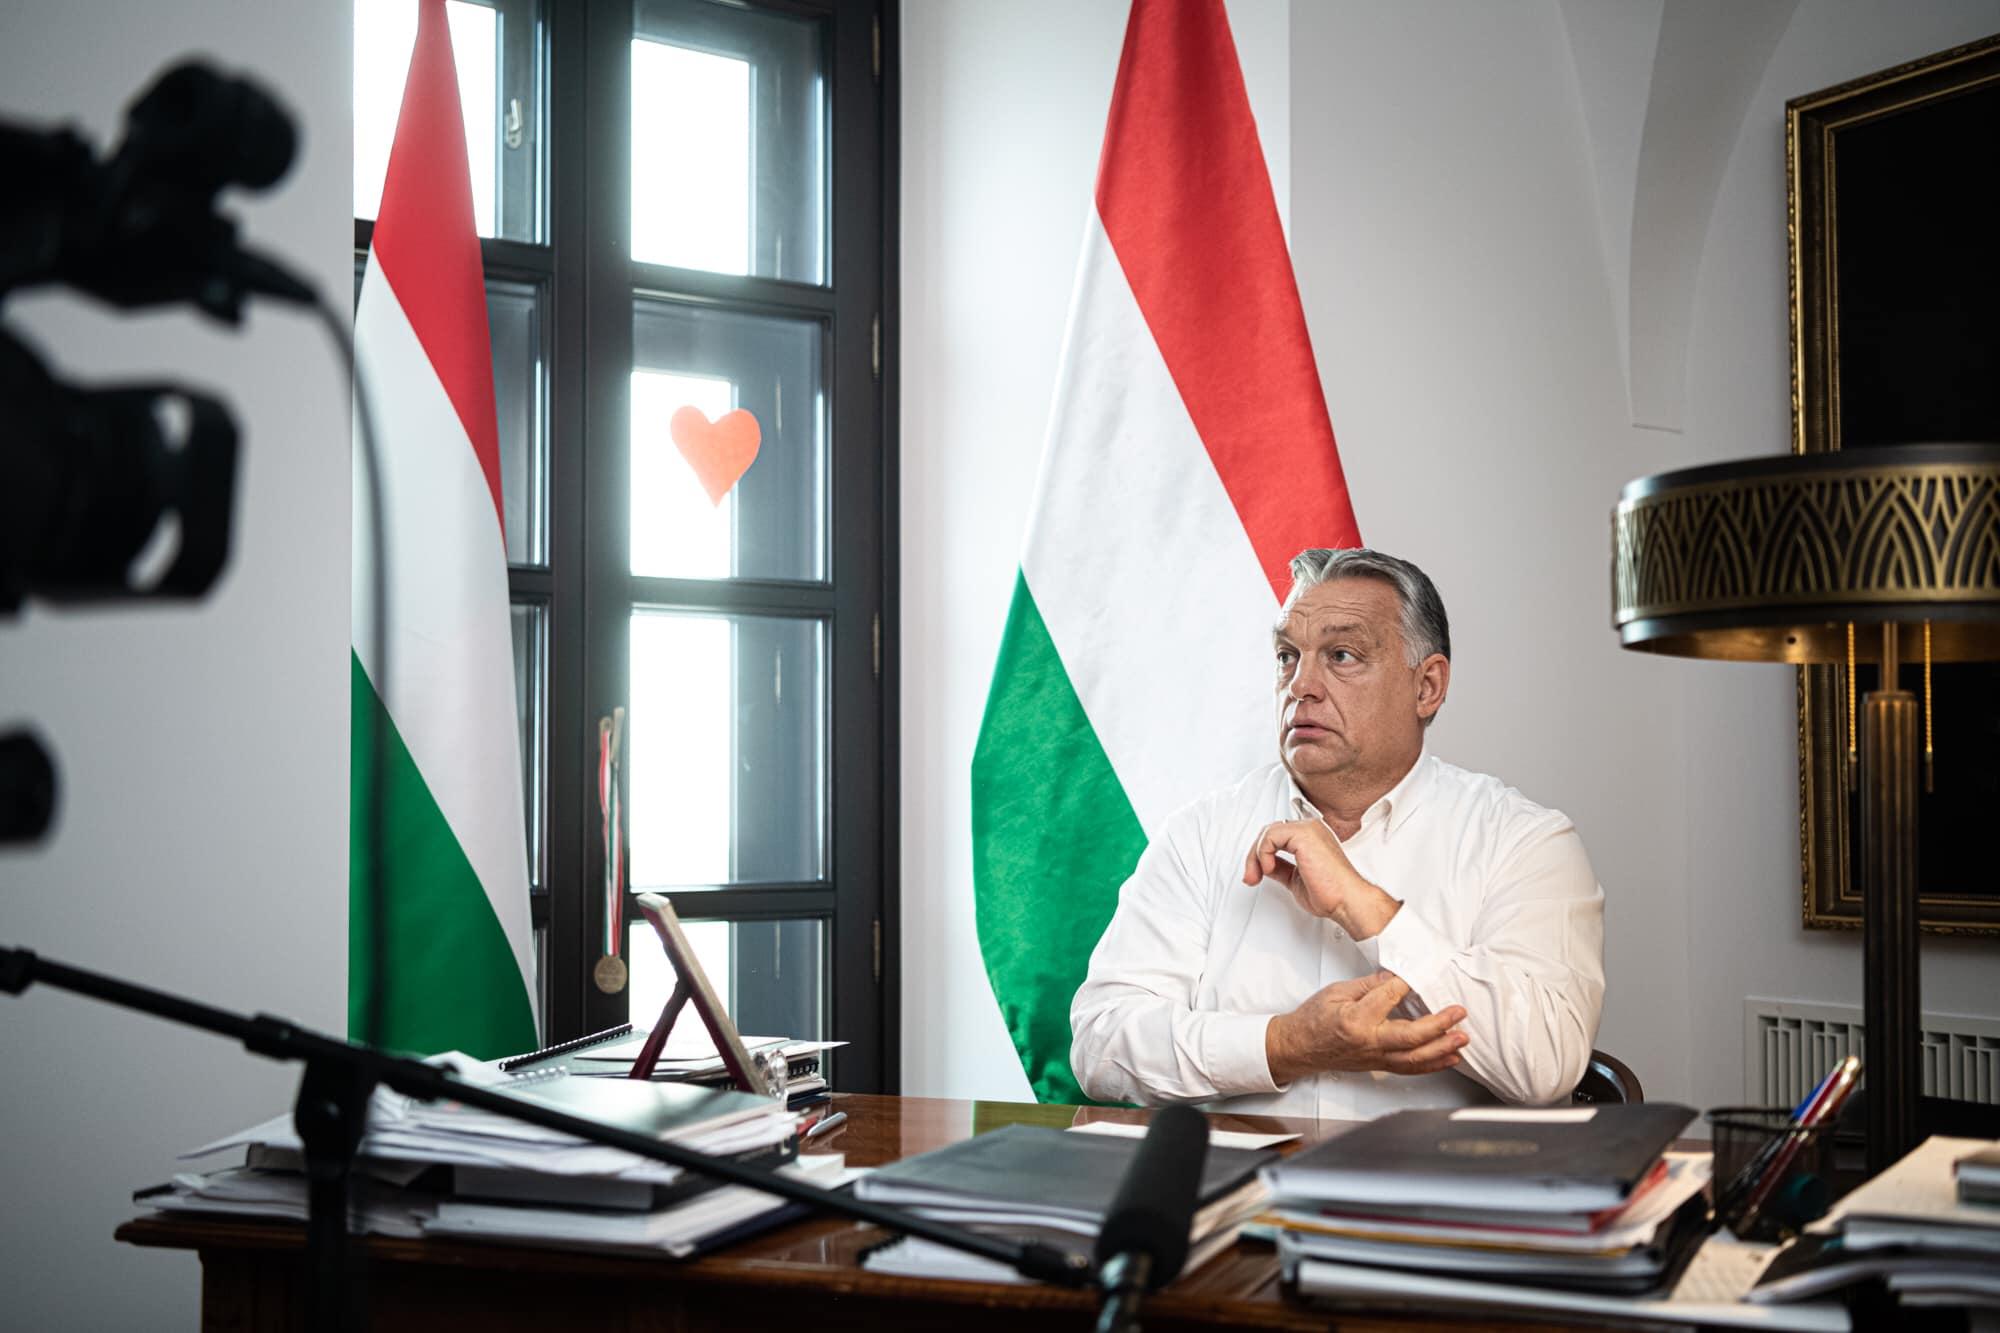 Hungarian Press Roundup: First Appraisals of 2020